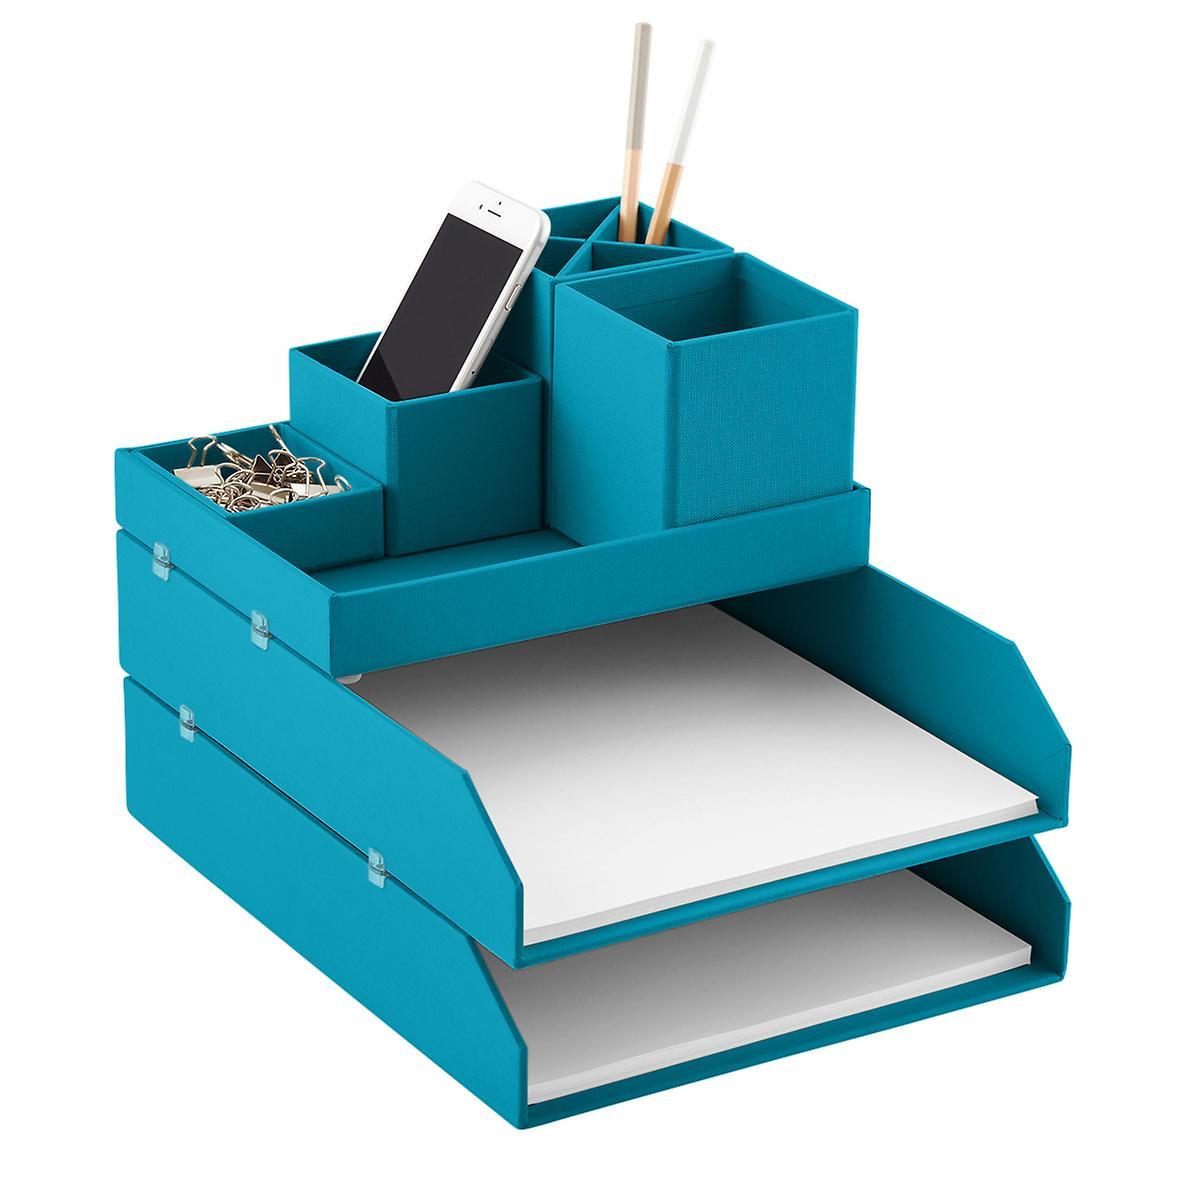 Desk Top Organizer  Bigso Turquoise Stockholm Desktop Organizer